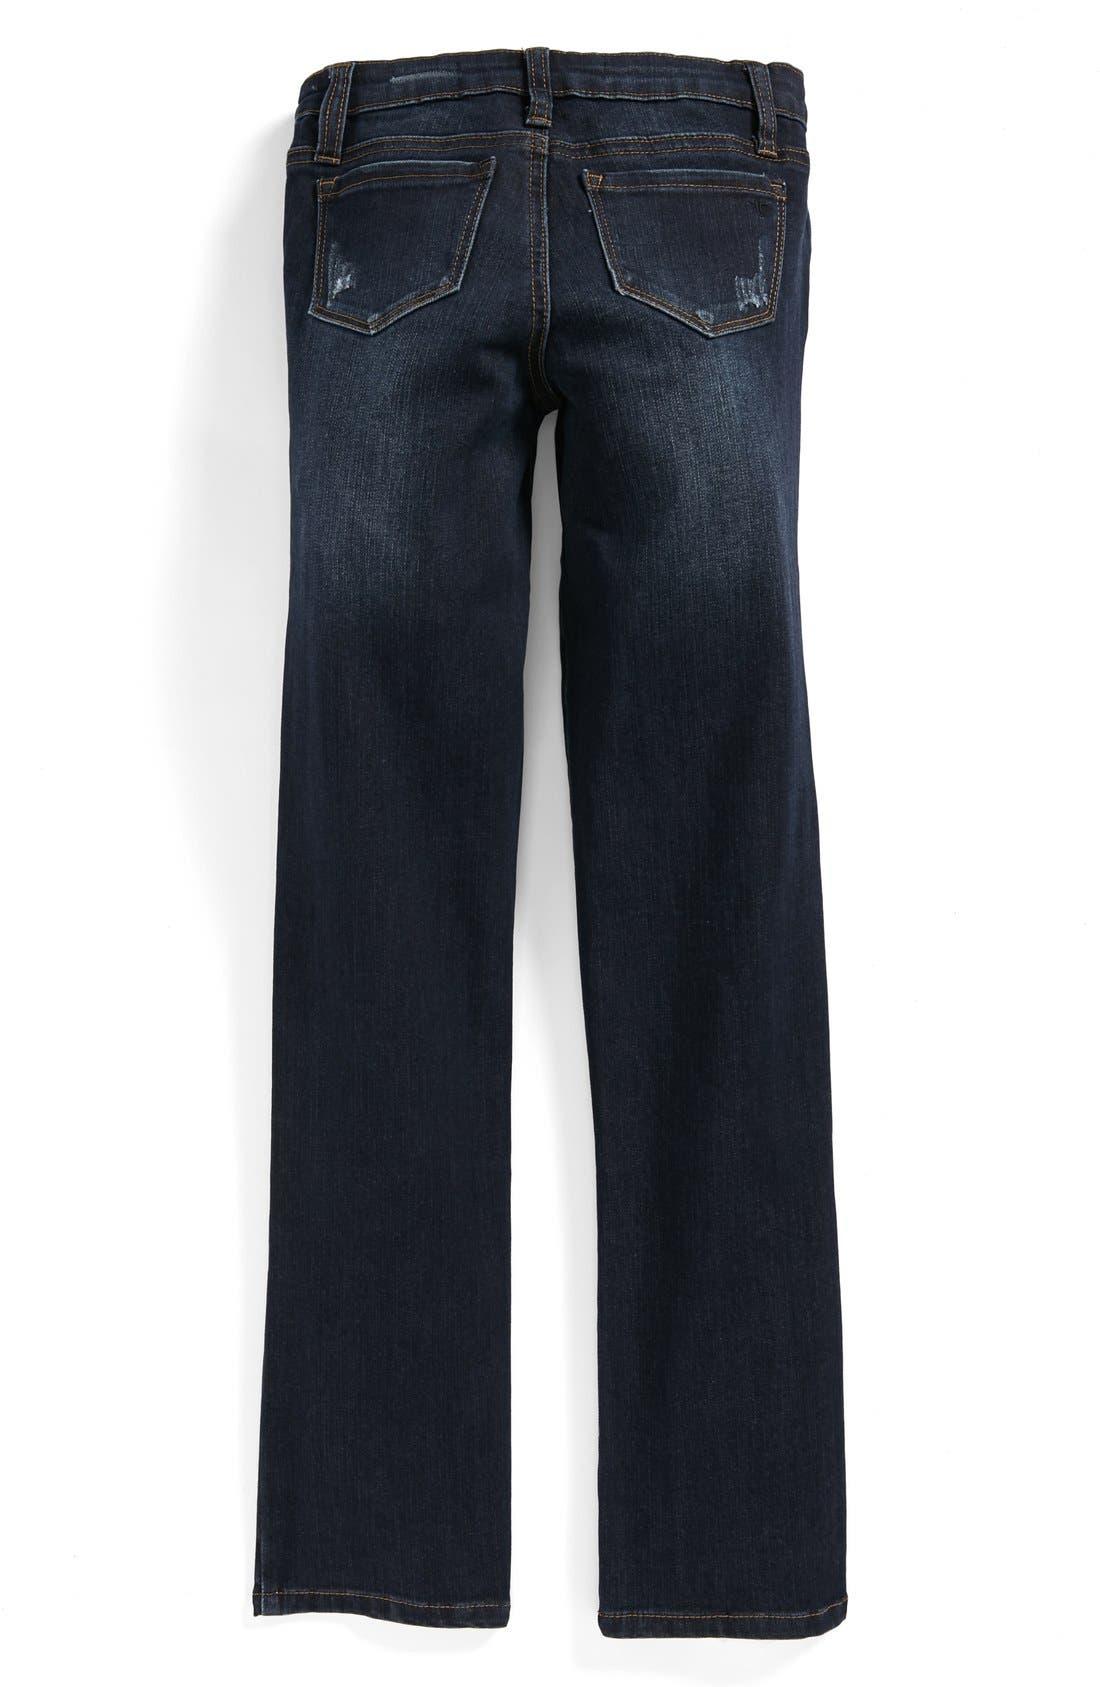 Main Image - Tractr Boyfriend Jeans (Big Girls)